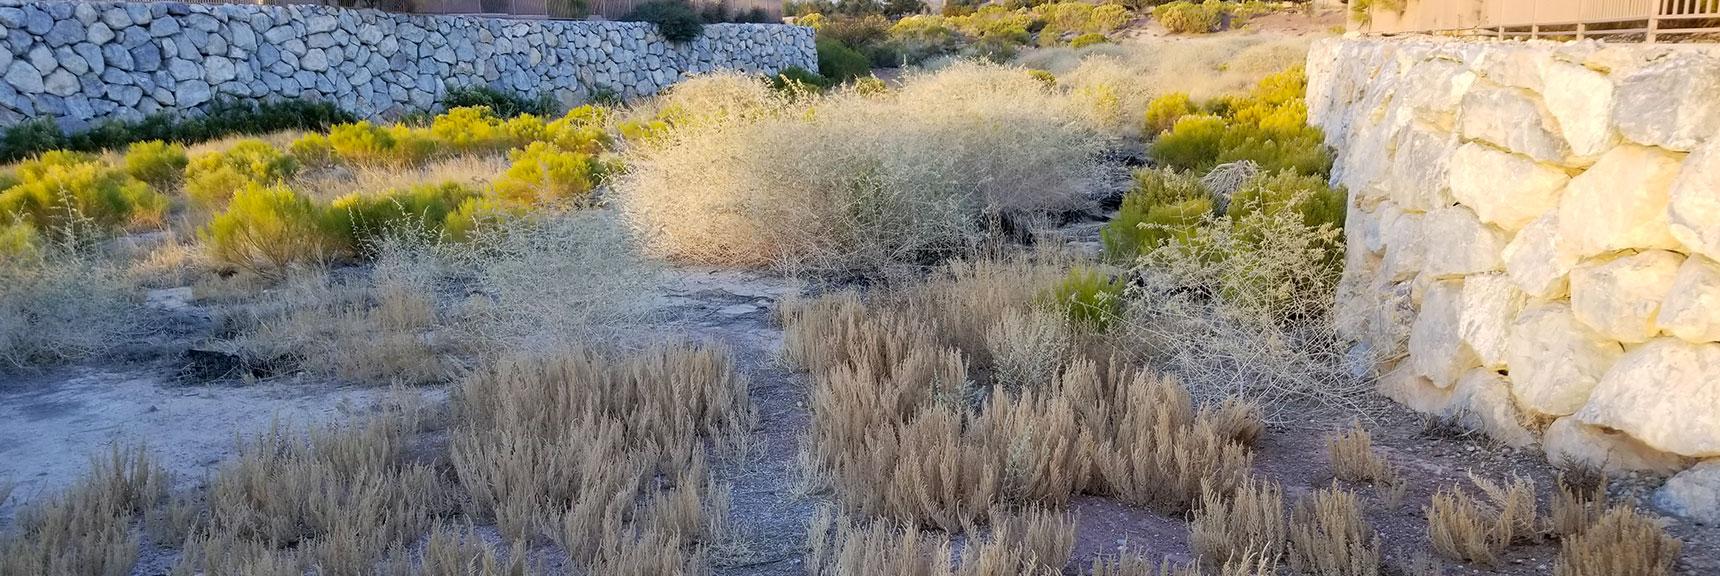 Environmental Consciousness in Las Vegas, Nevada, Slide 006